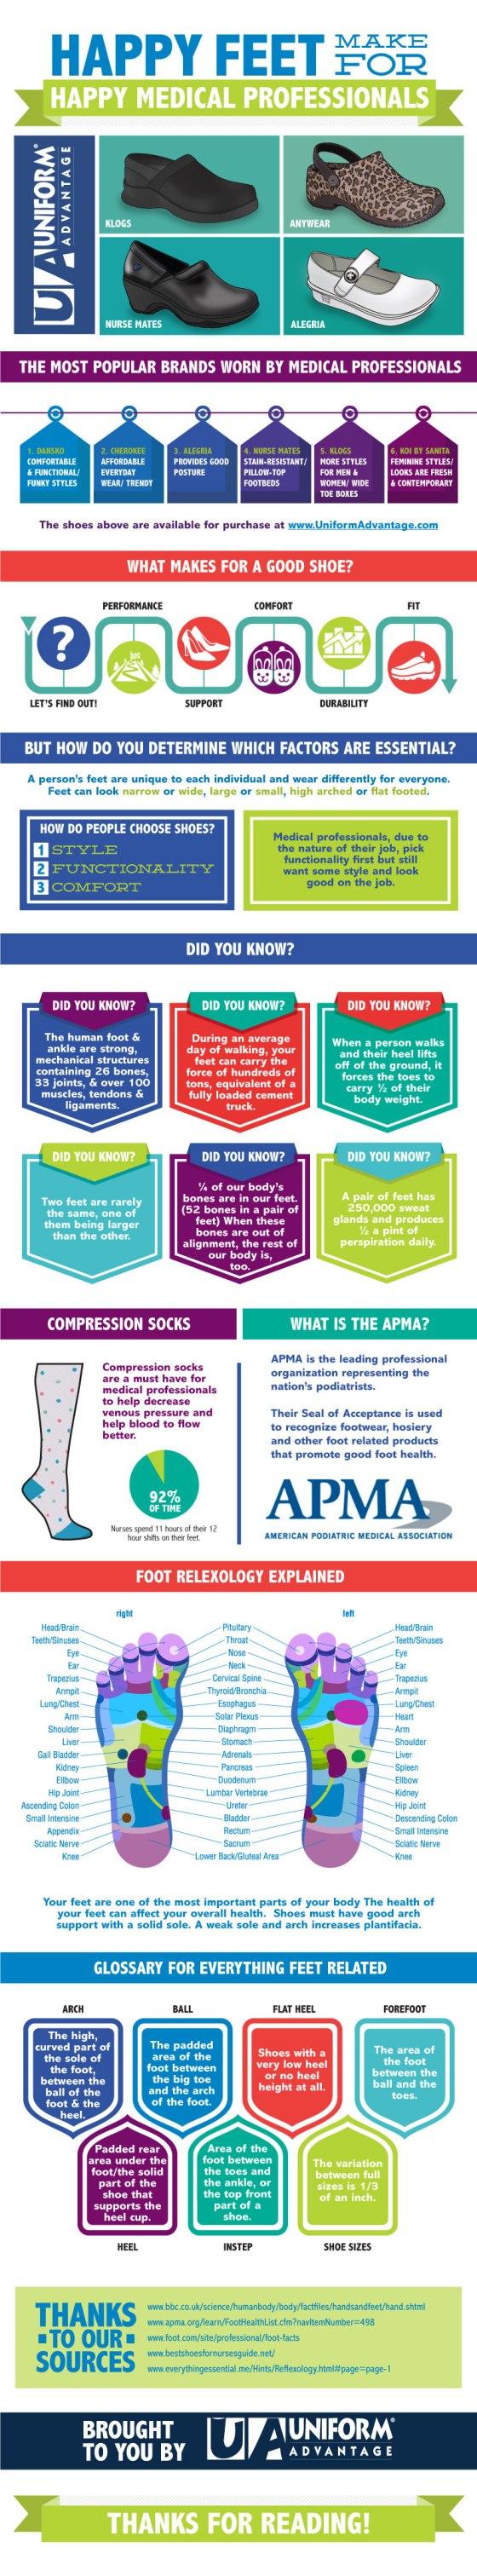 Infographic : Happy Feet makes Happy Healthcare Professionals